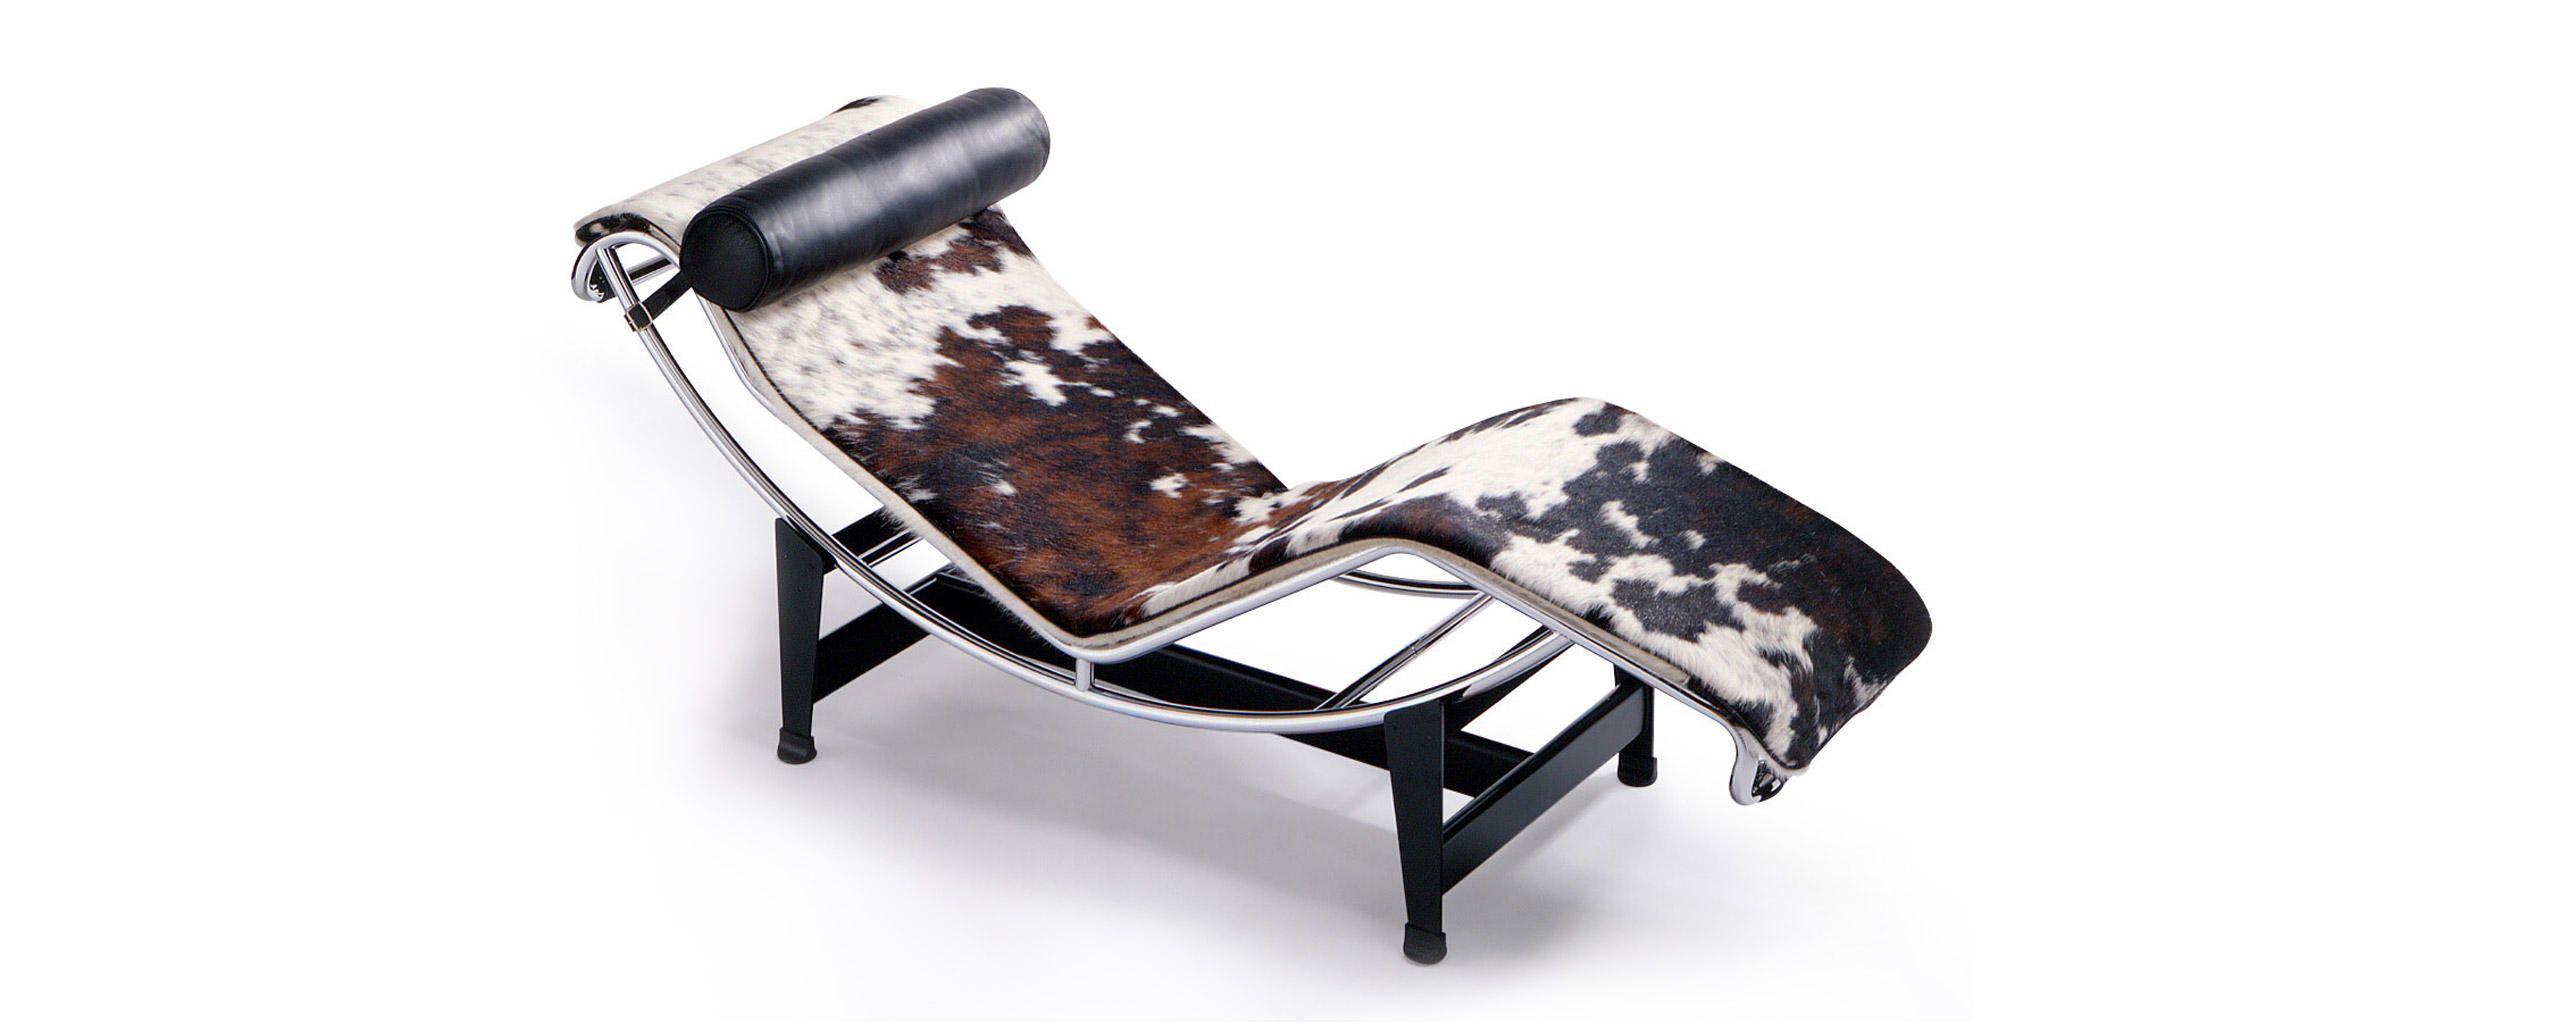 le corbusier pierre jeanneret charlotte perriand fauteuil grand